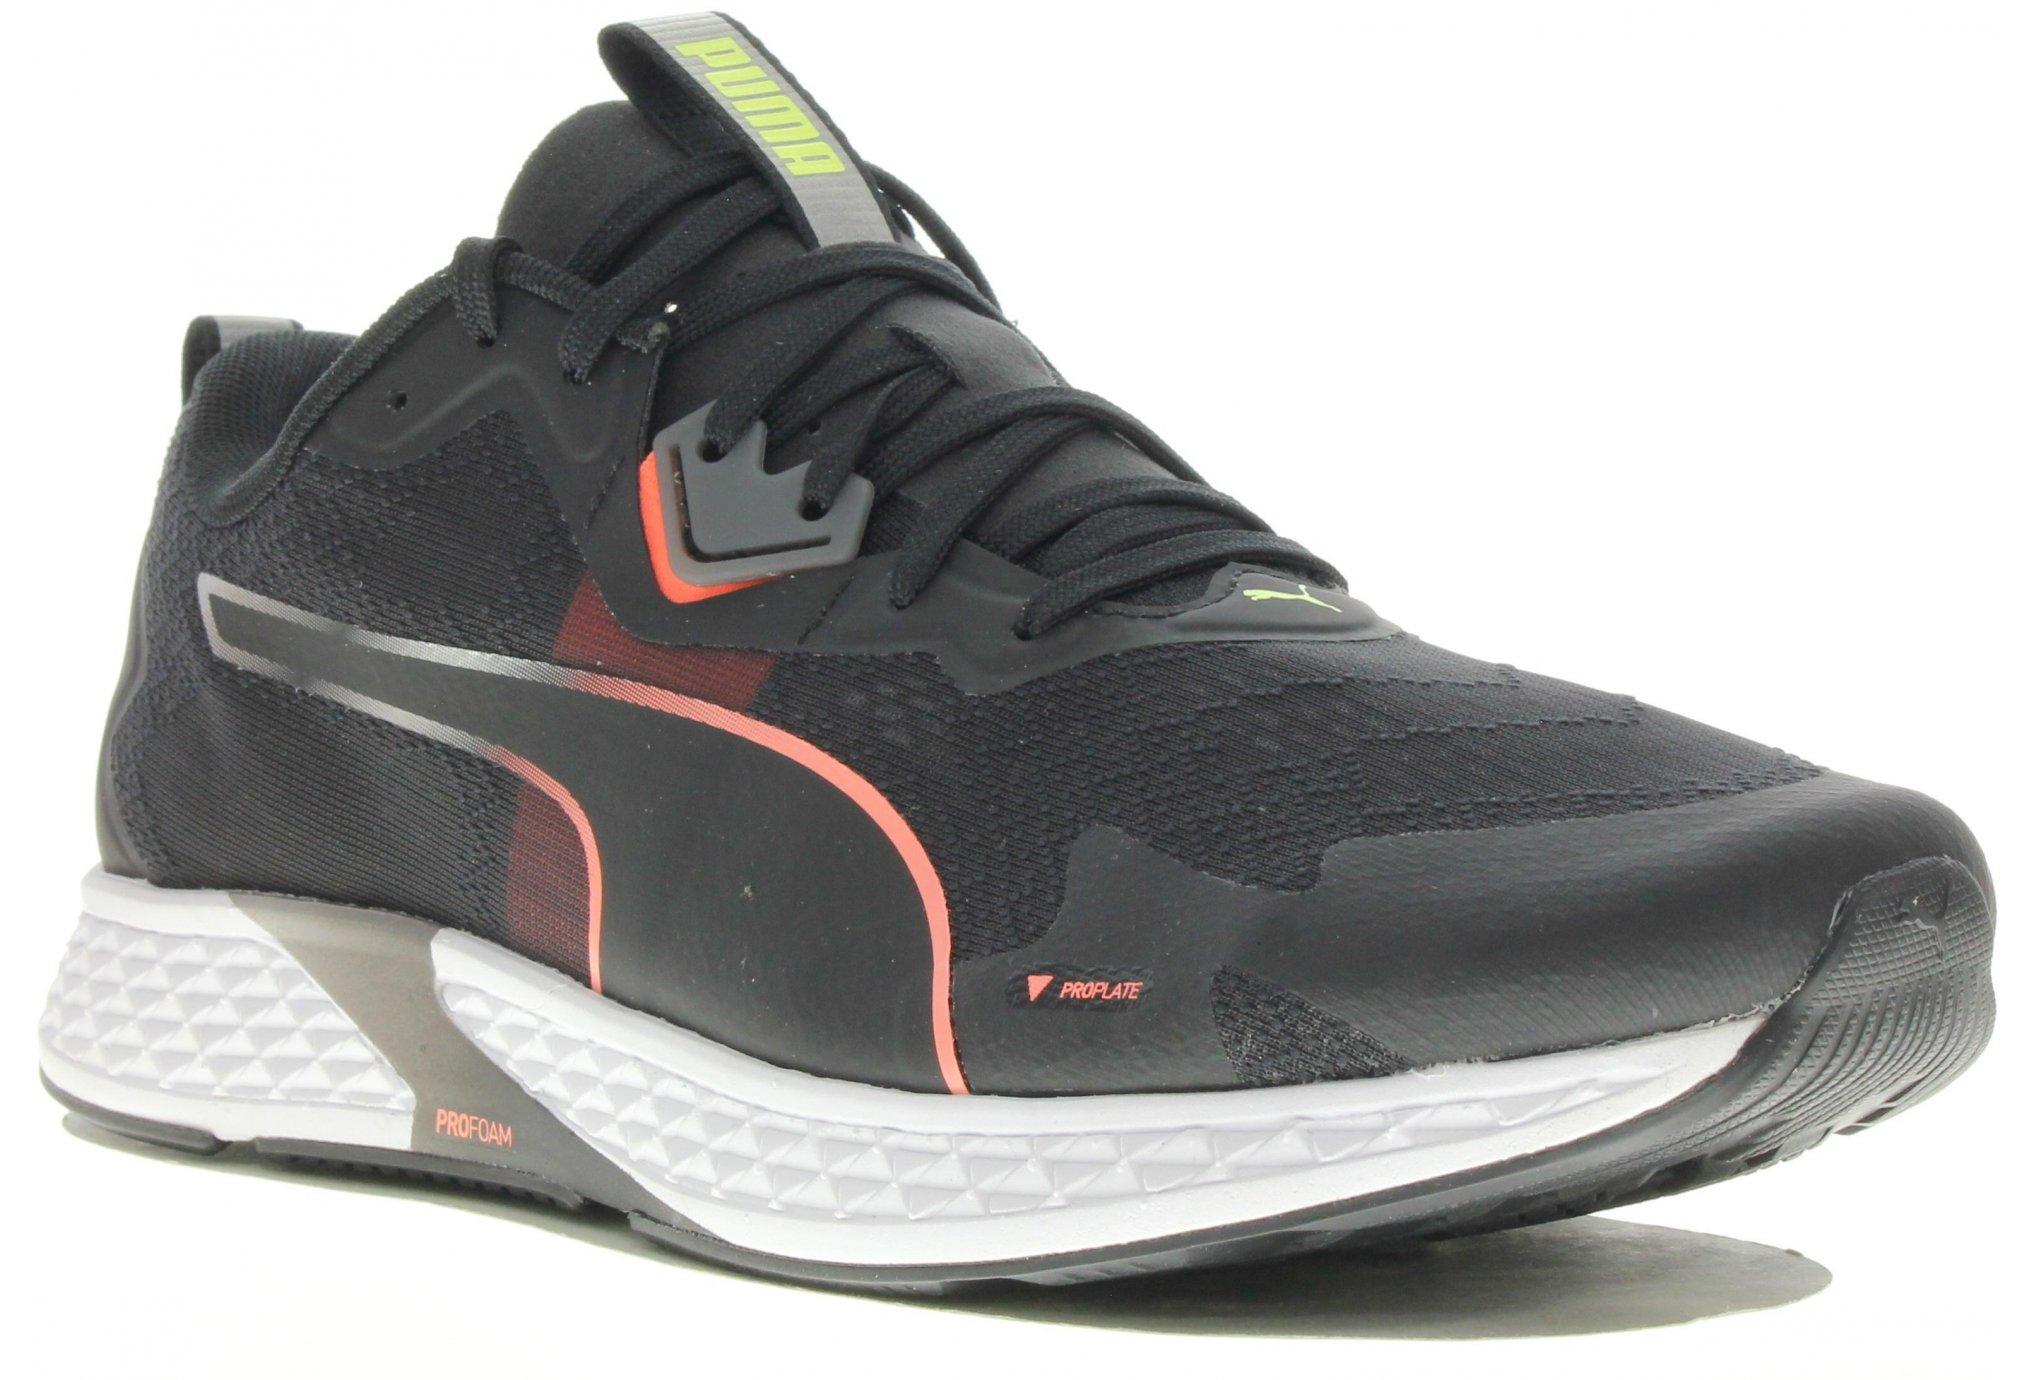 Puma Speed 500 2 M Chaussures homme